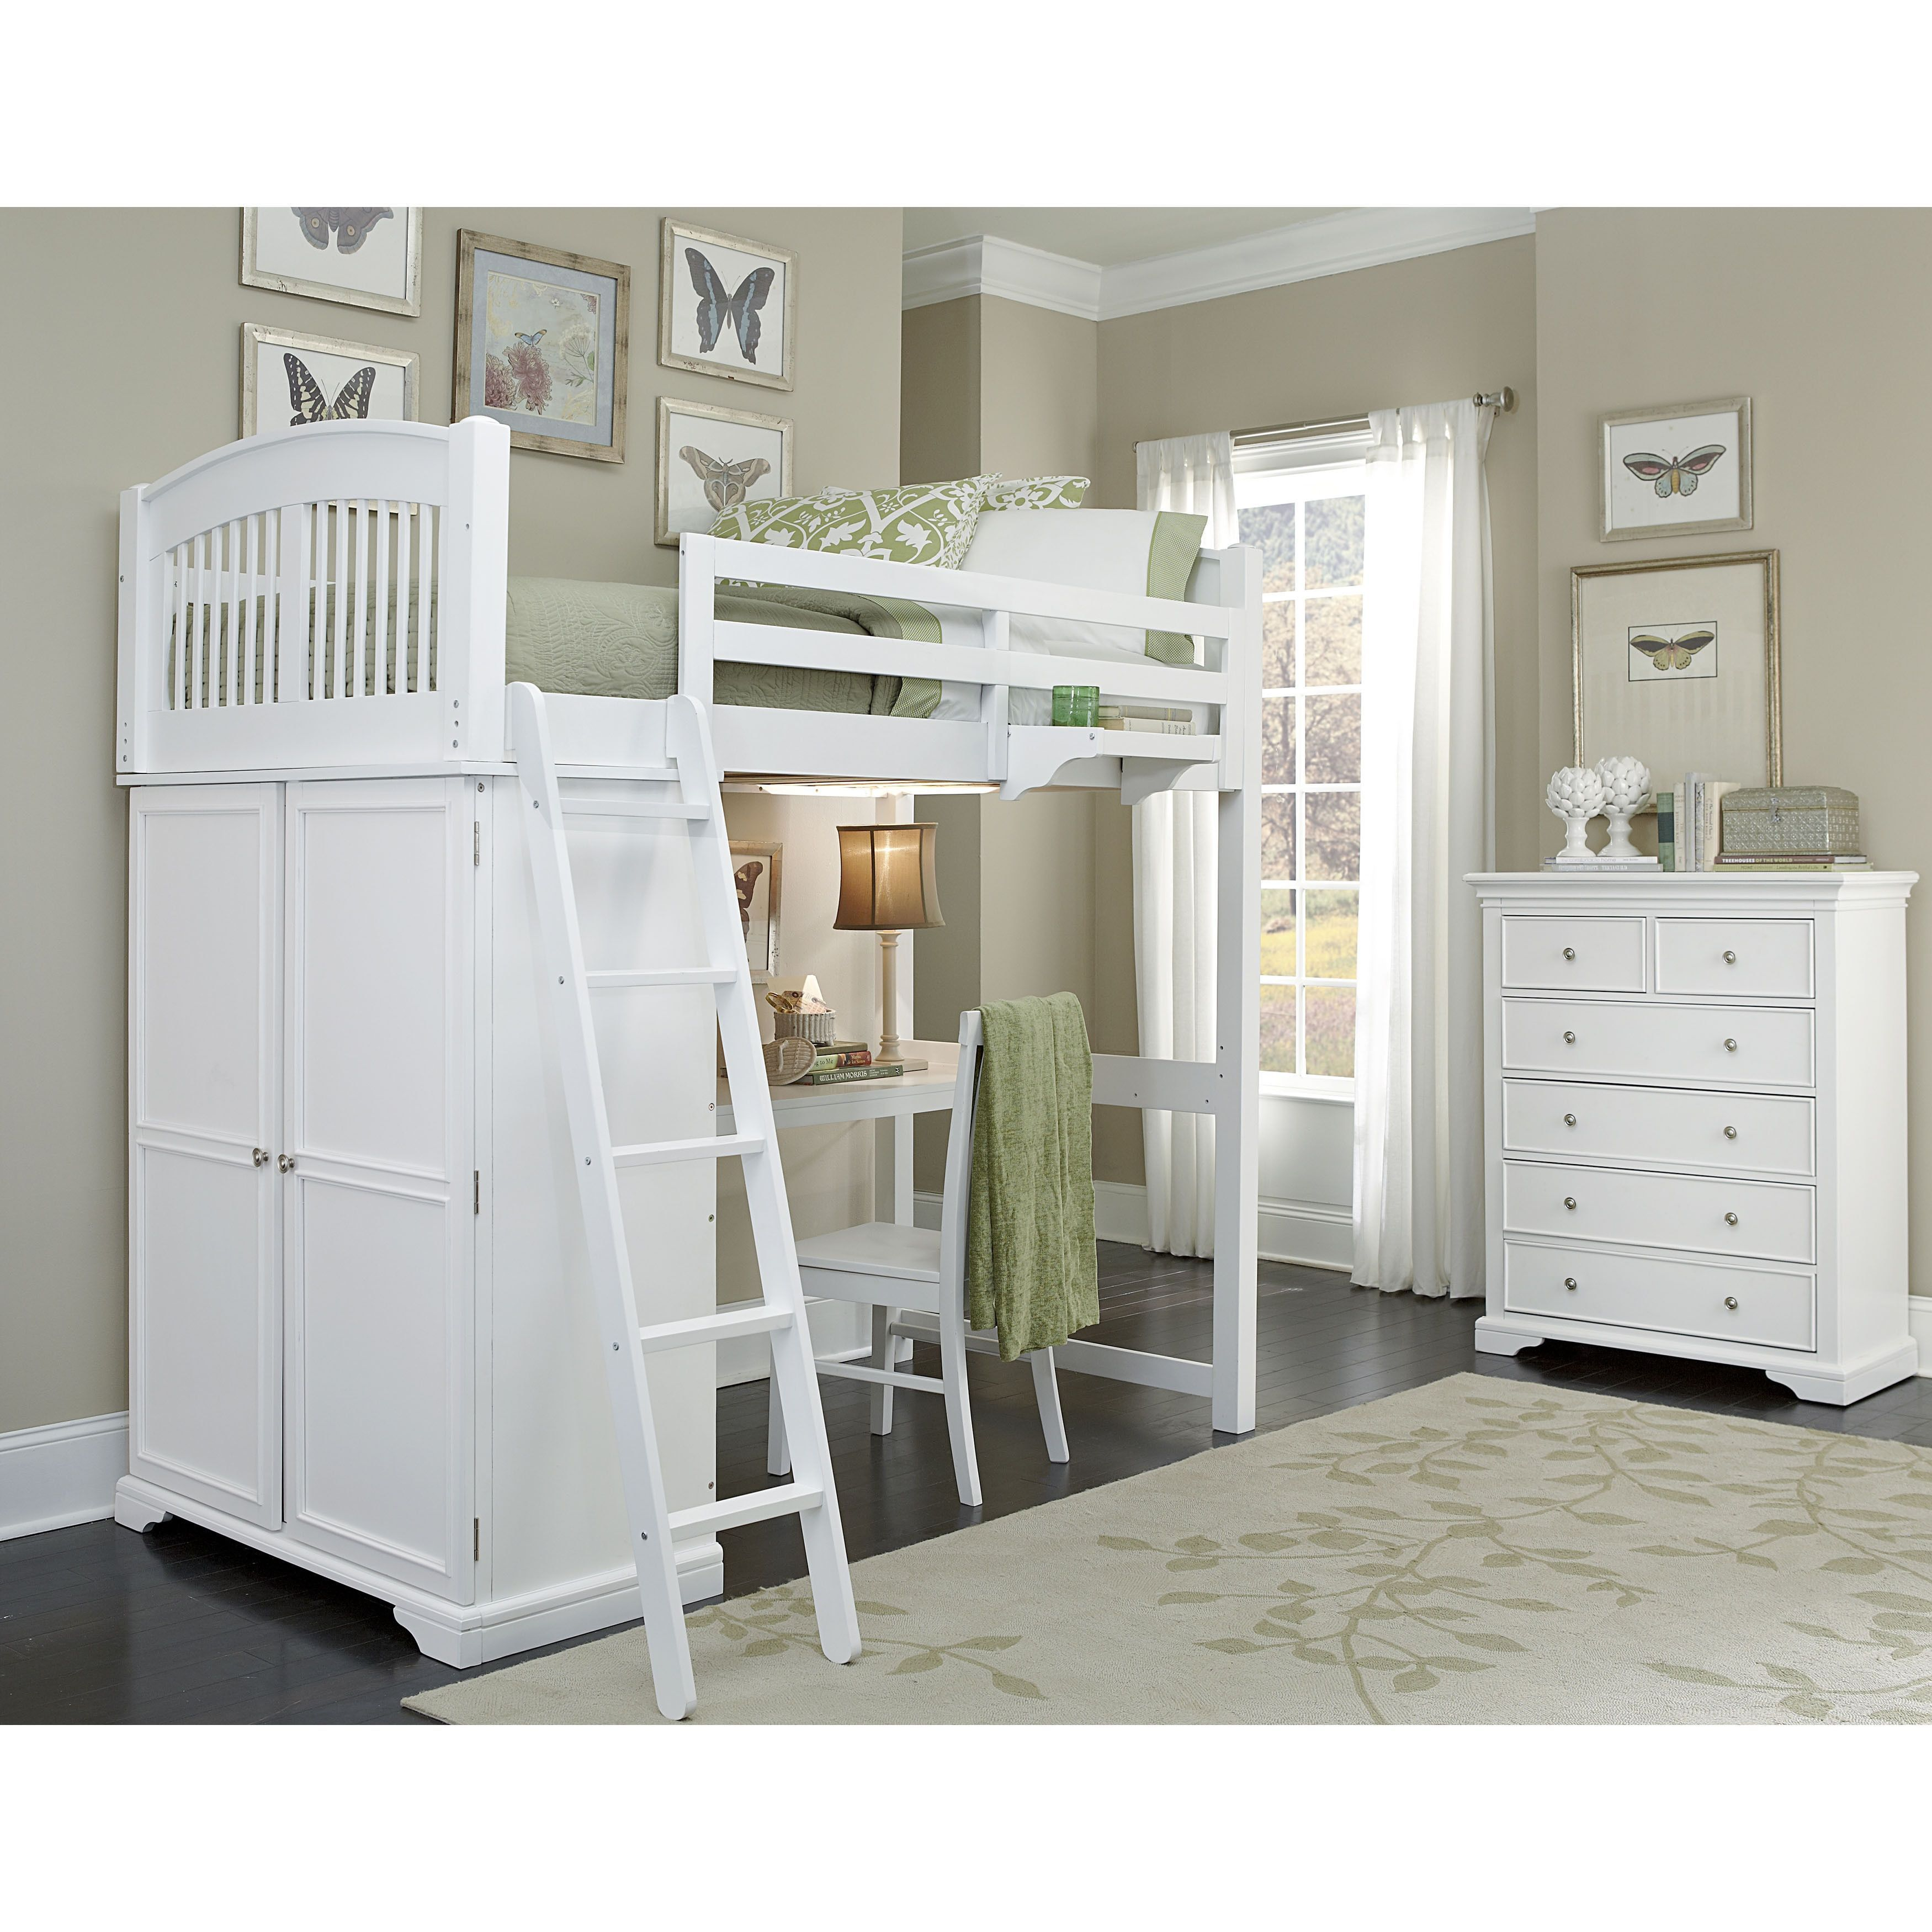 Ne Kids Walnut Street White Wood Locker Loft Bed Storage And Desk